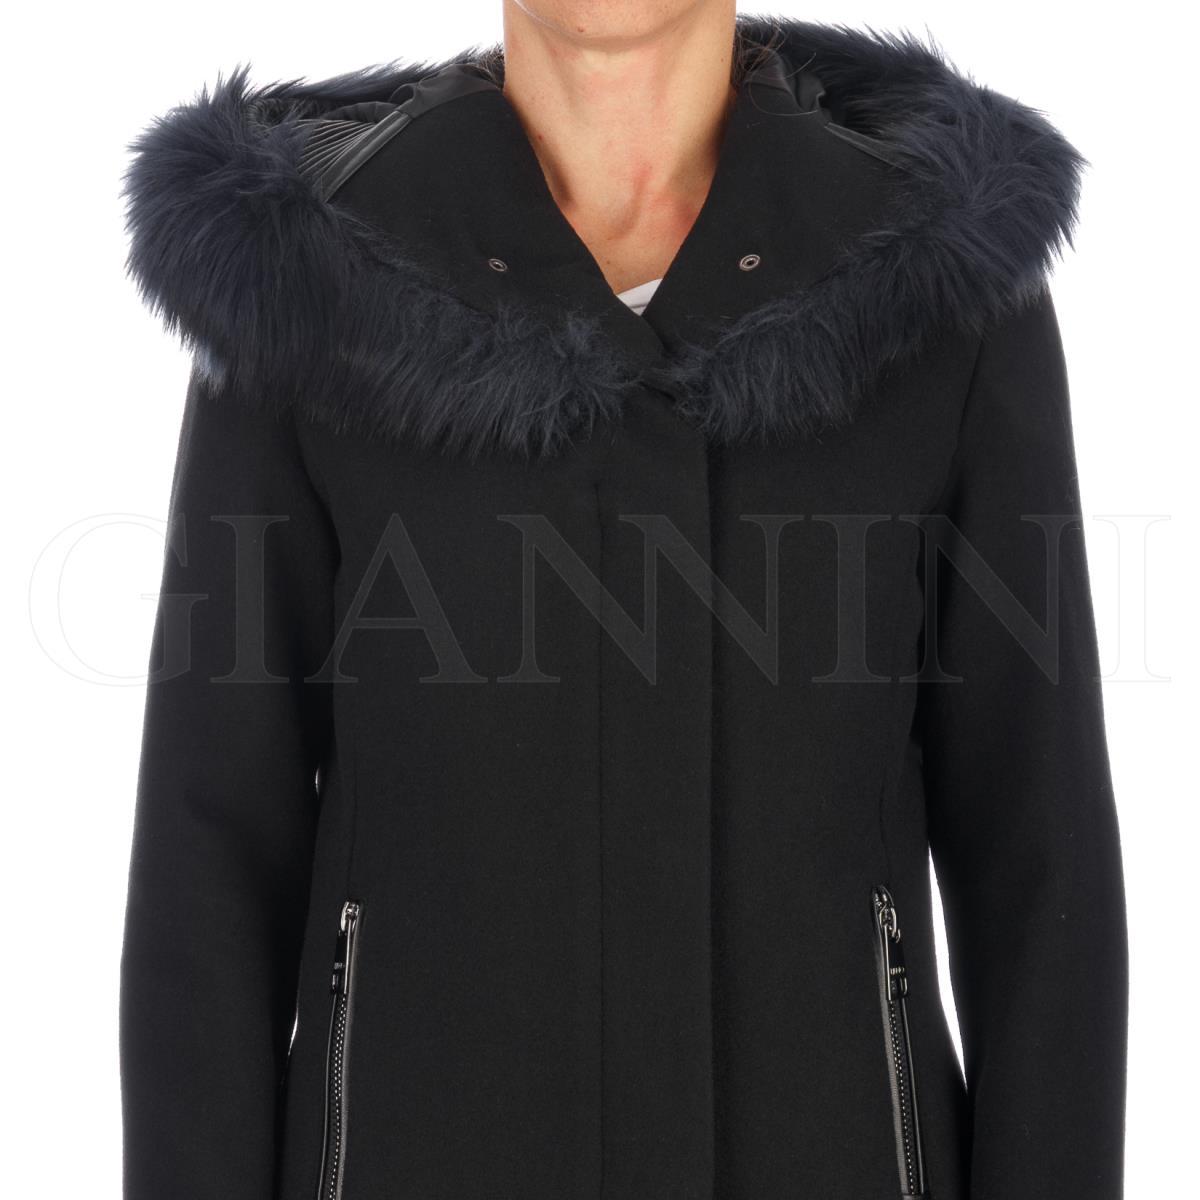 Liu°jo Giannini Shop Online F67286t9951 Cappotto fRUqwfr